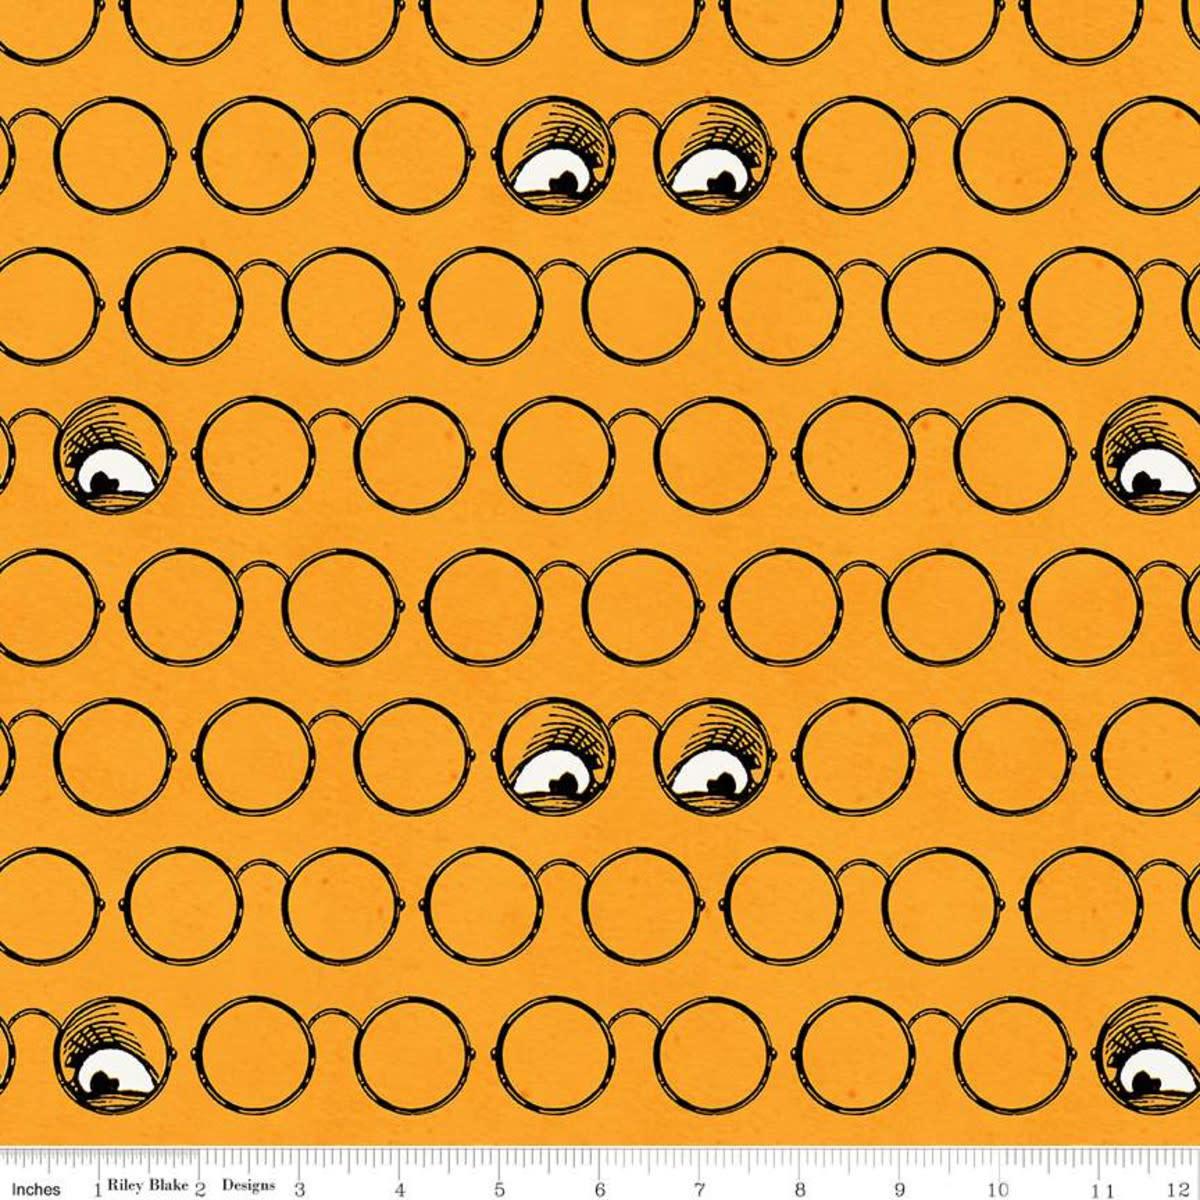 RILEY BLAKE DESIGNS Goose Tales, Spooky Specs Orange, per cm or $20/m